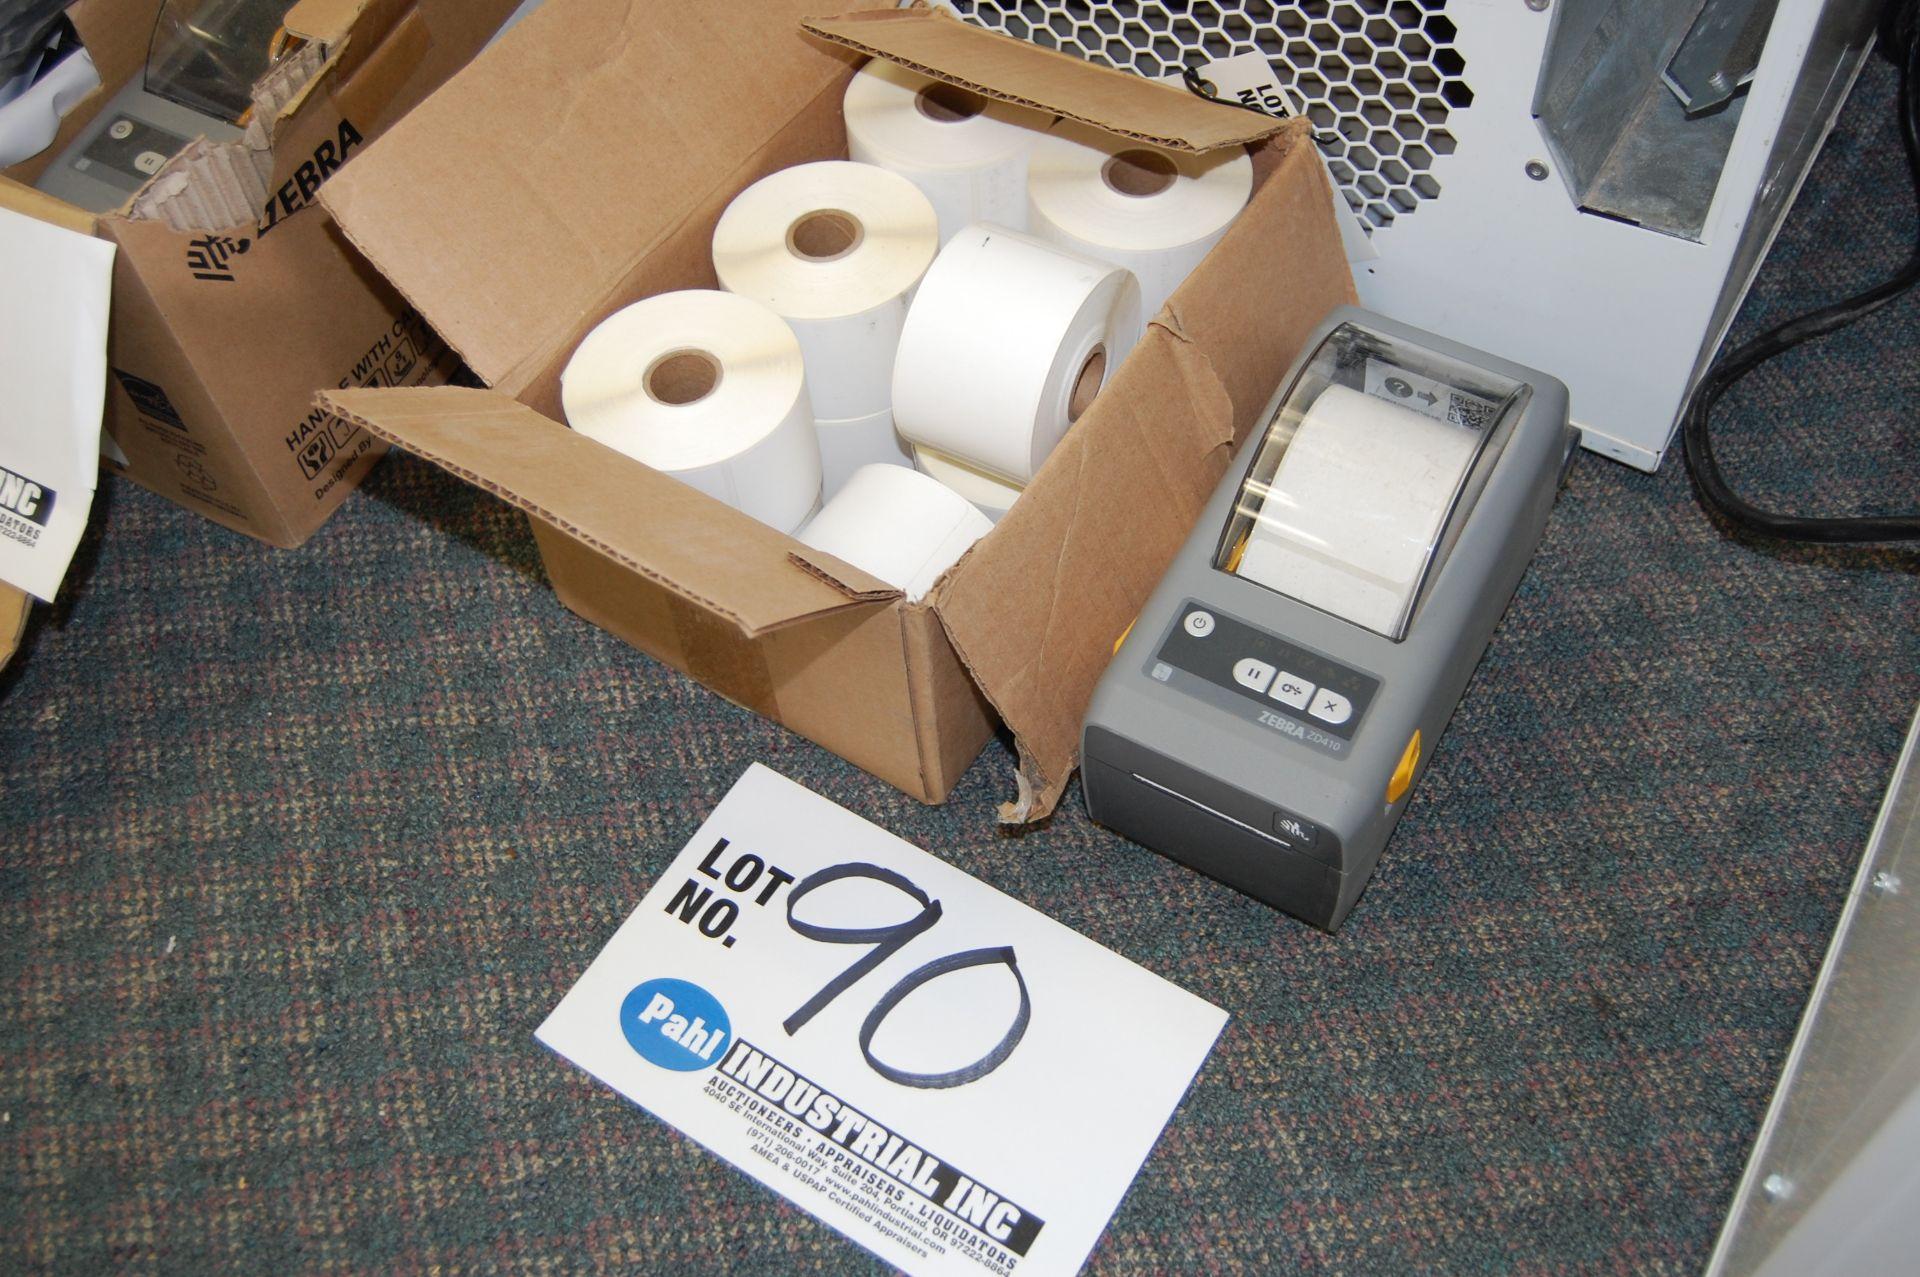 Lot 90 - Zebra ZD410 Direct Thermal Barcode Printer